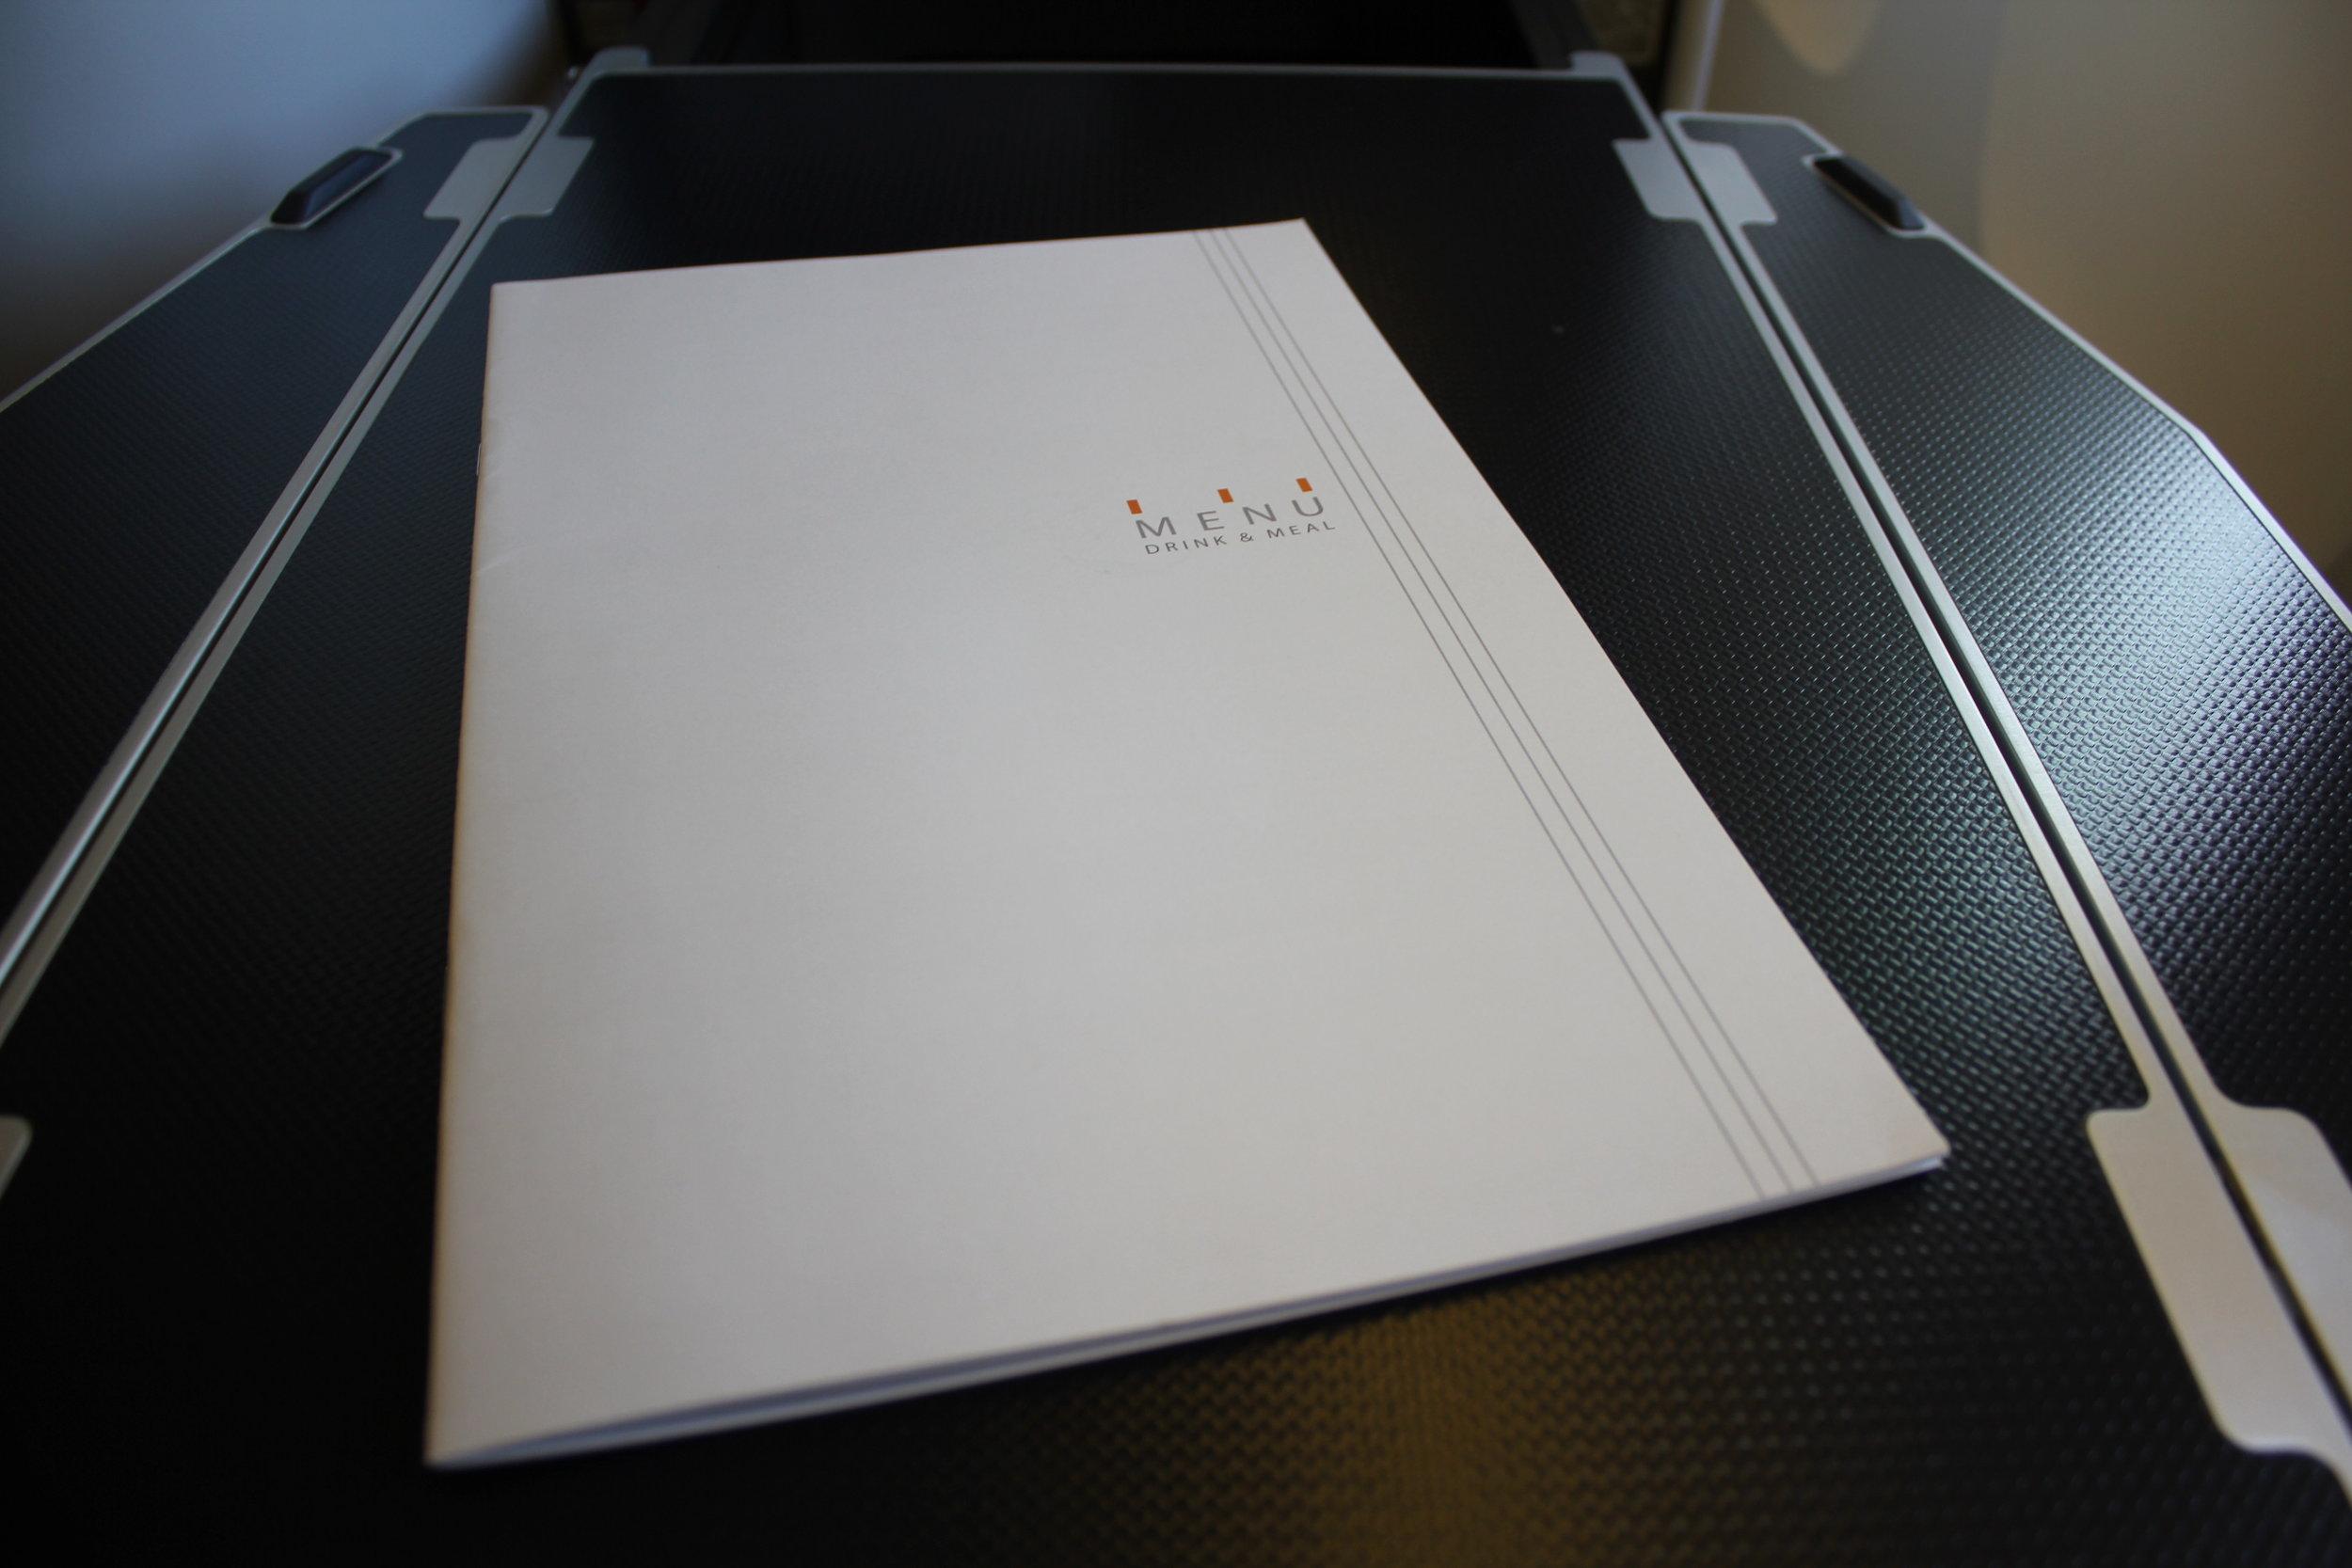 ANA 777 business class – Menu